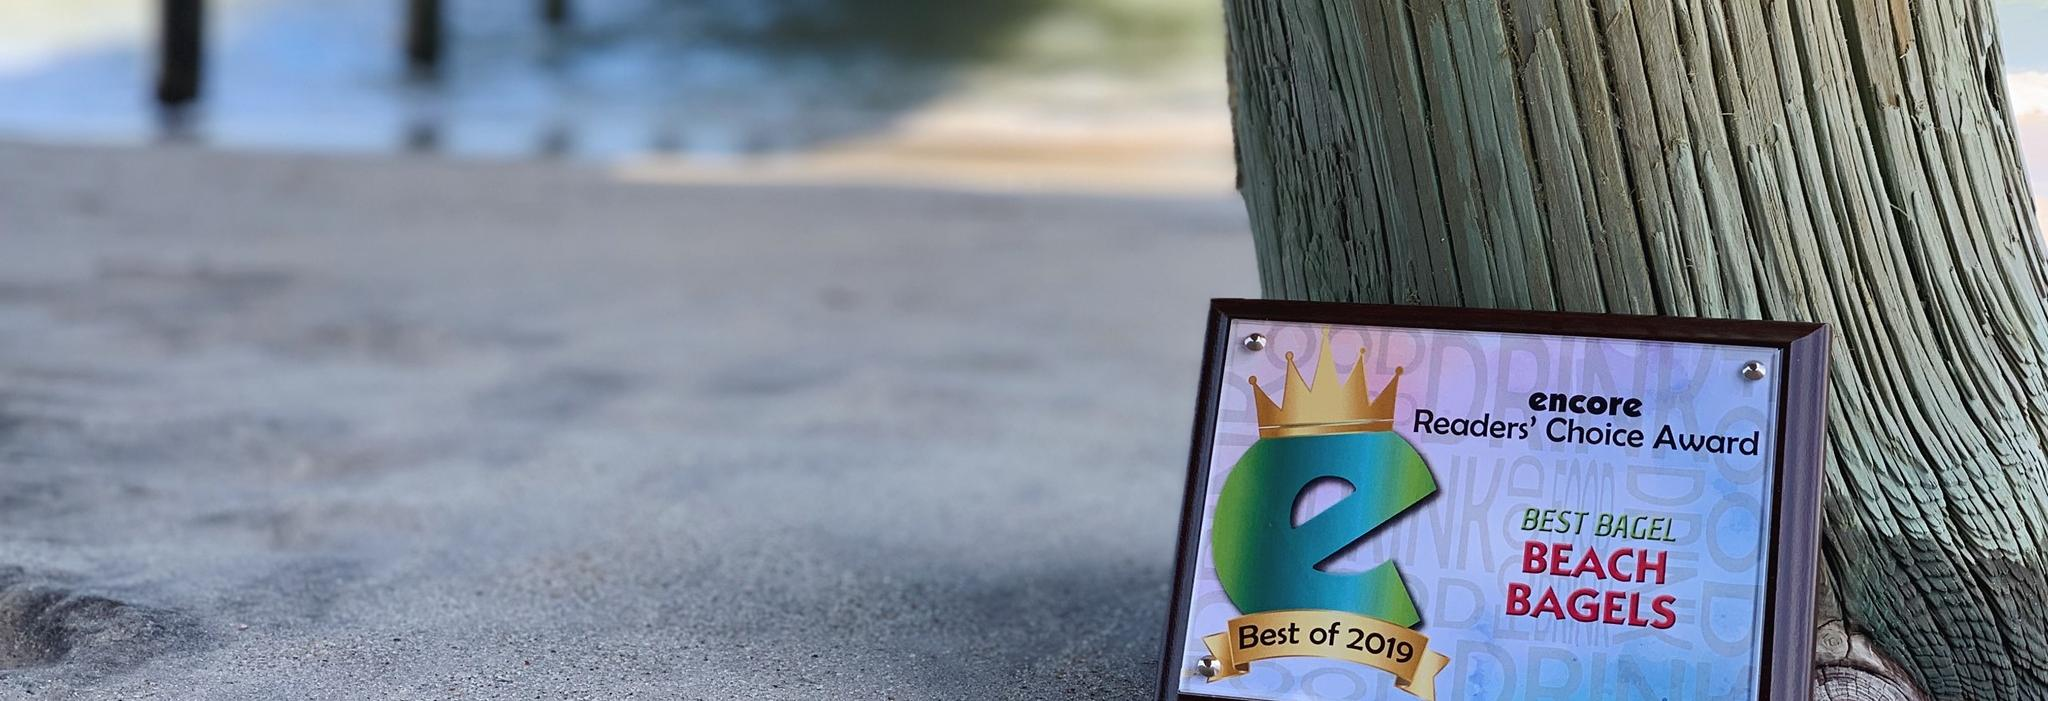 Beach Bagels in North Carolina banner